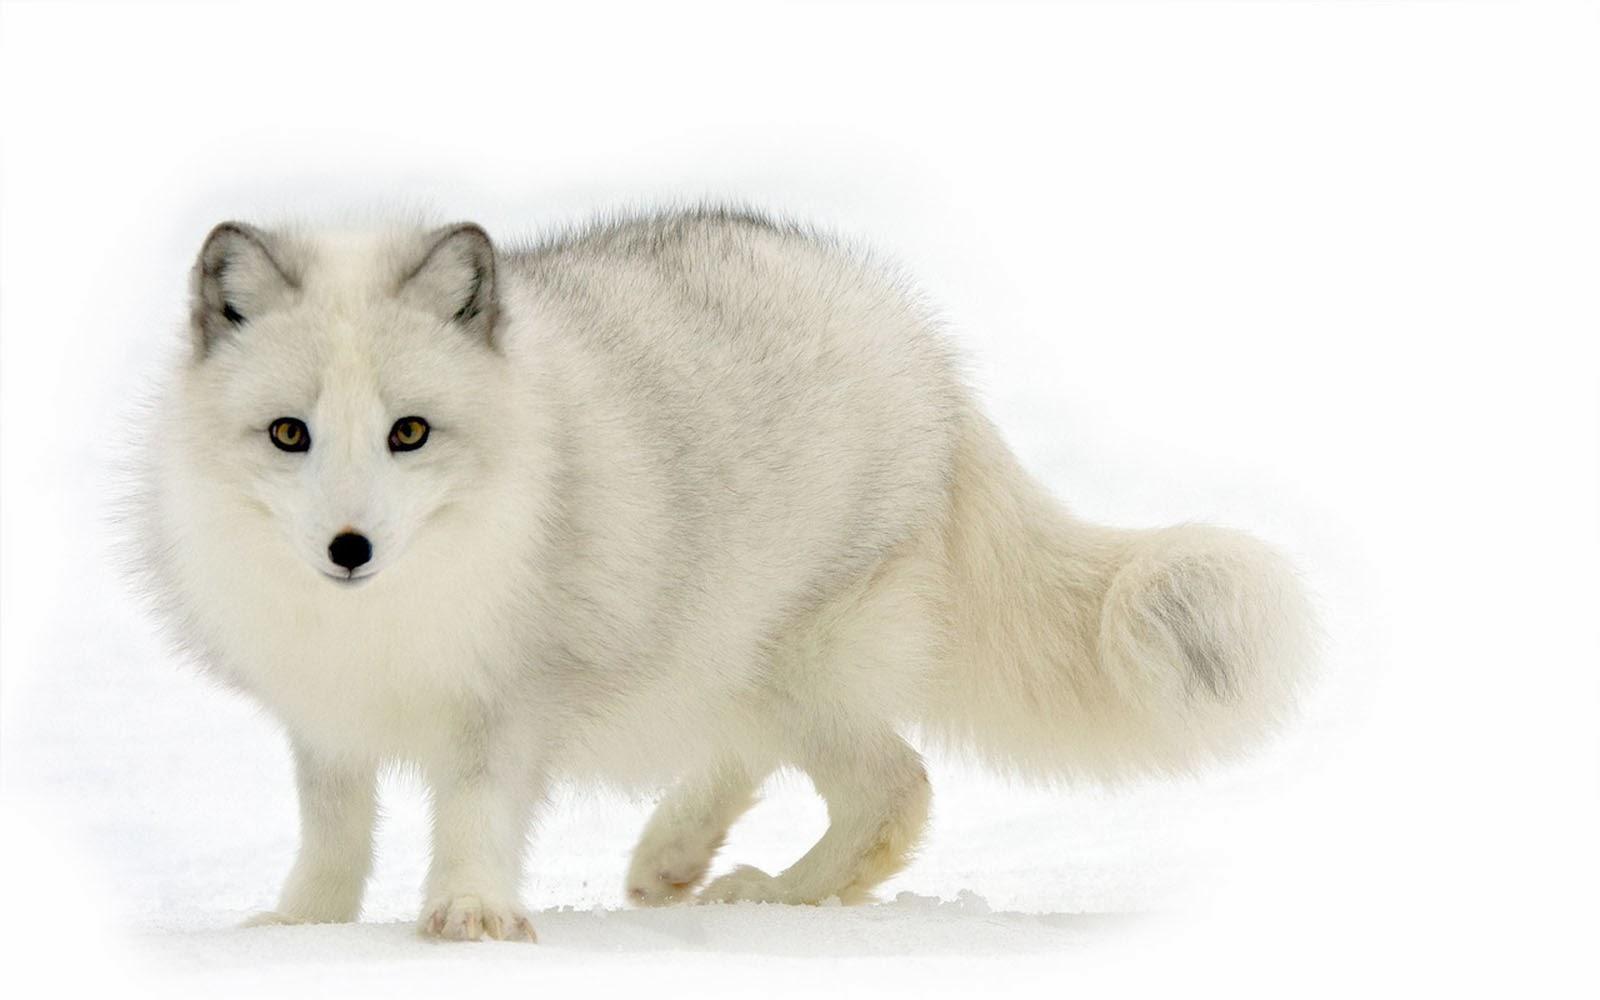 Wallpapers Polar Fox Wallpapers